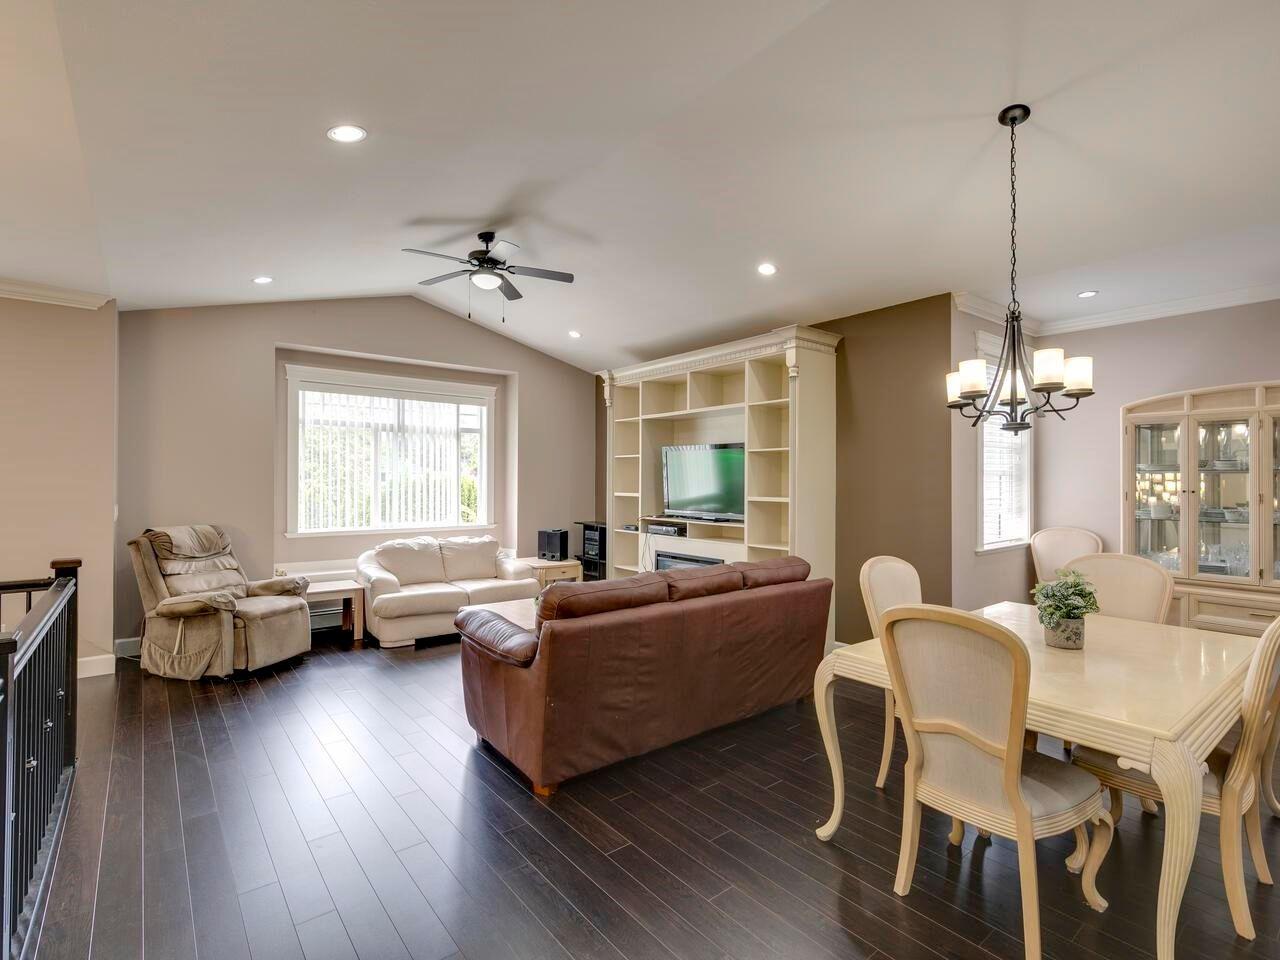 "Photo 6: Photos: 22845 126B Avenue in Maple Ridge: East Central House for sale in ""EAST CENTRAL MAPLE RIDGE"" : MLS®# R2594638"